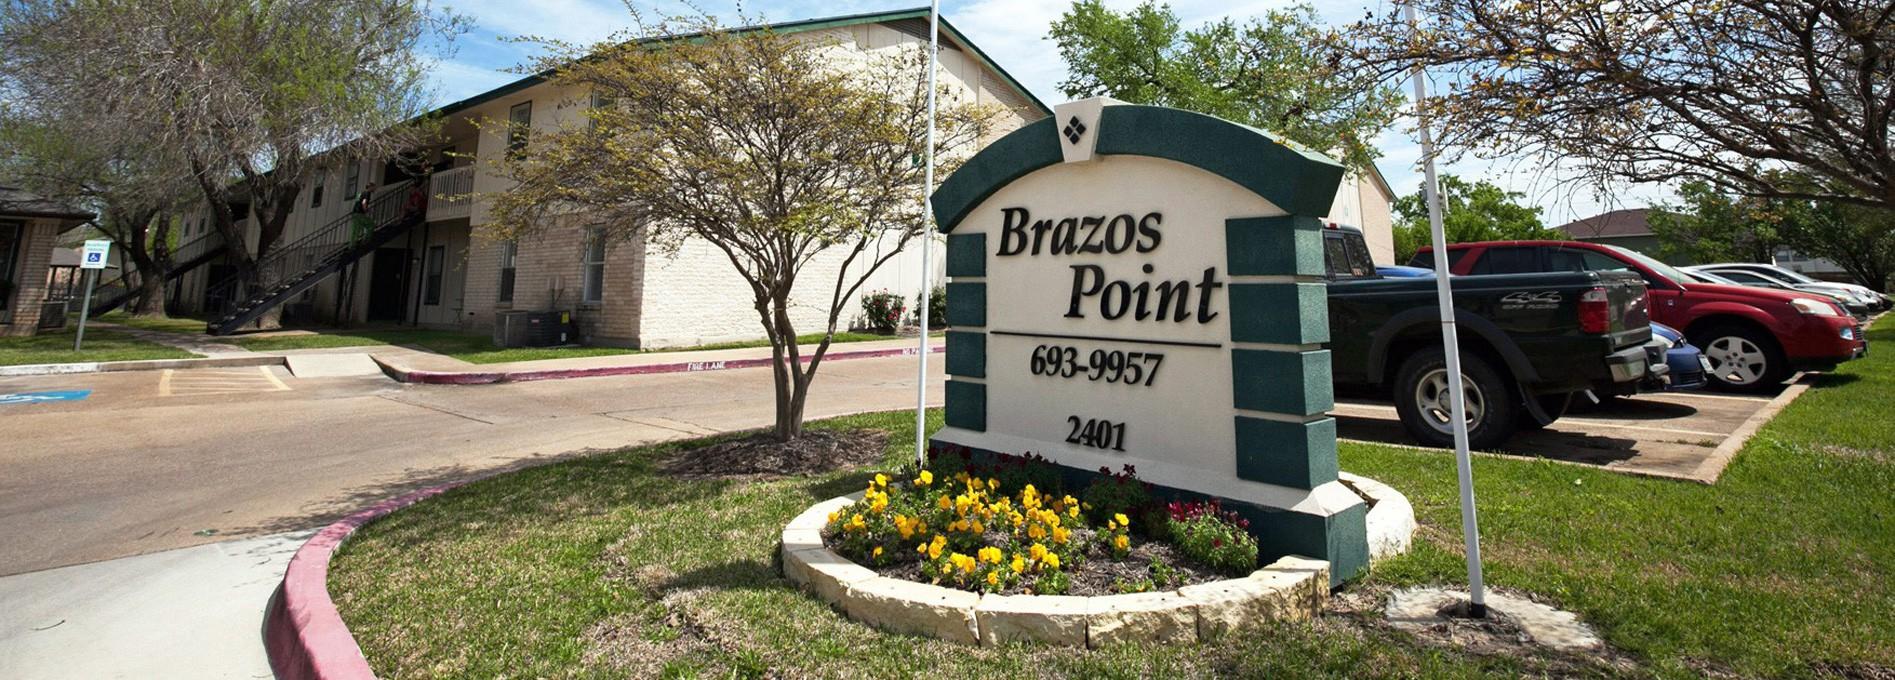 Brazos Point 05a